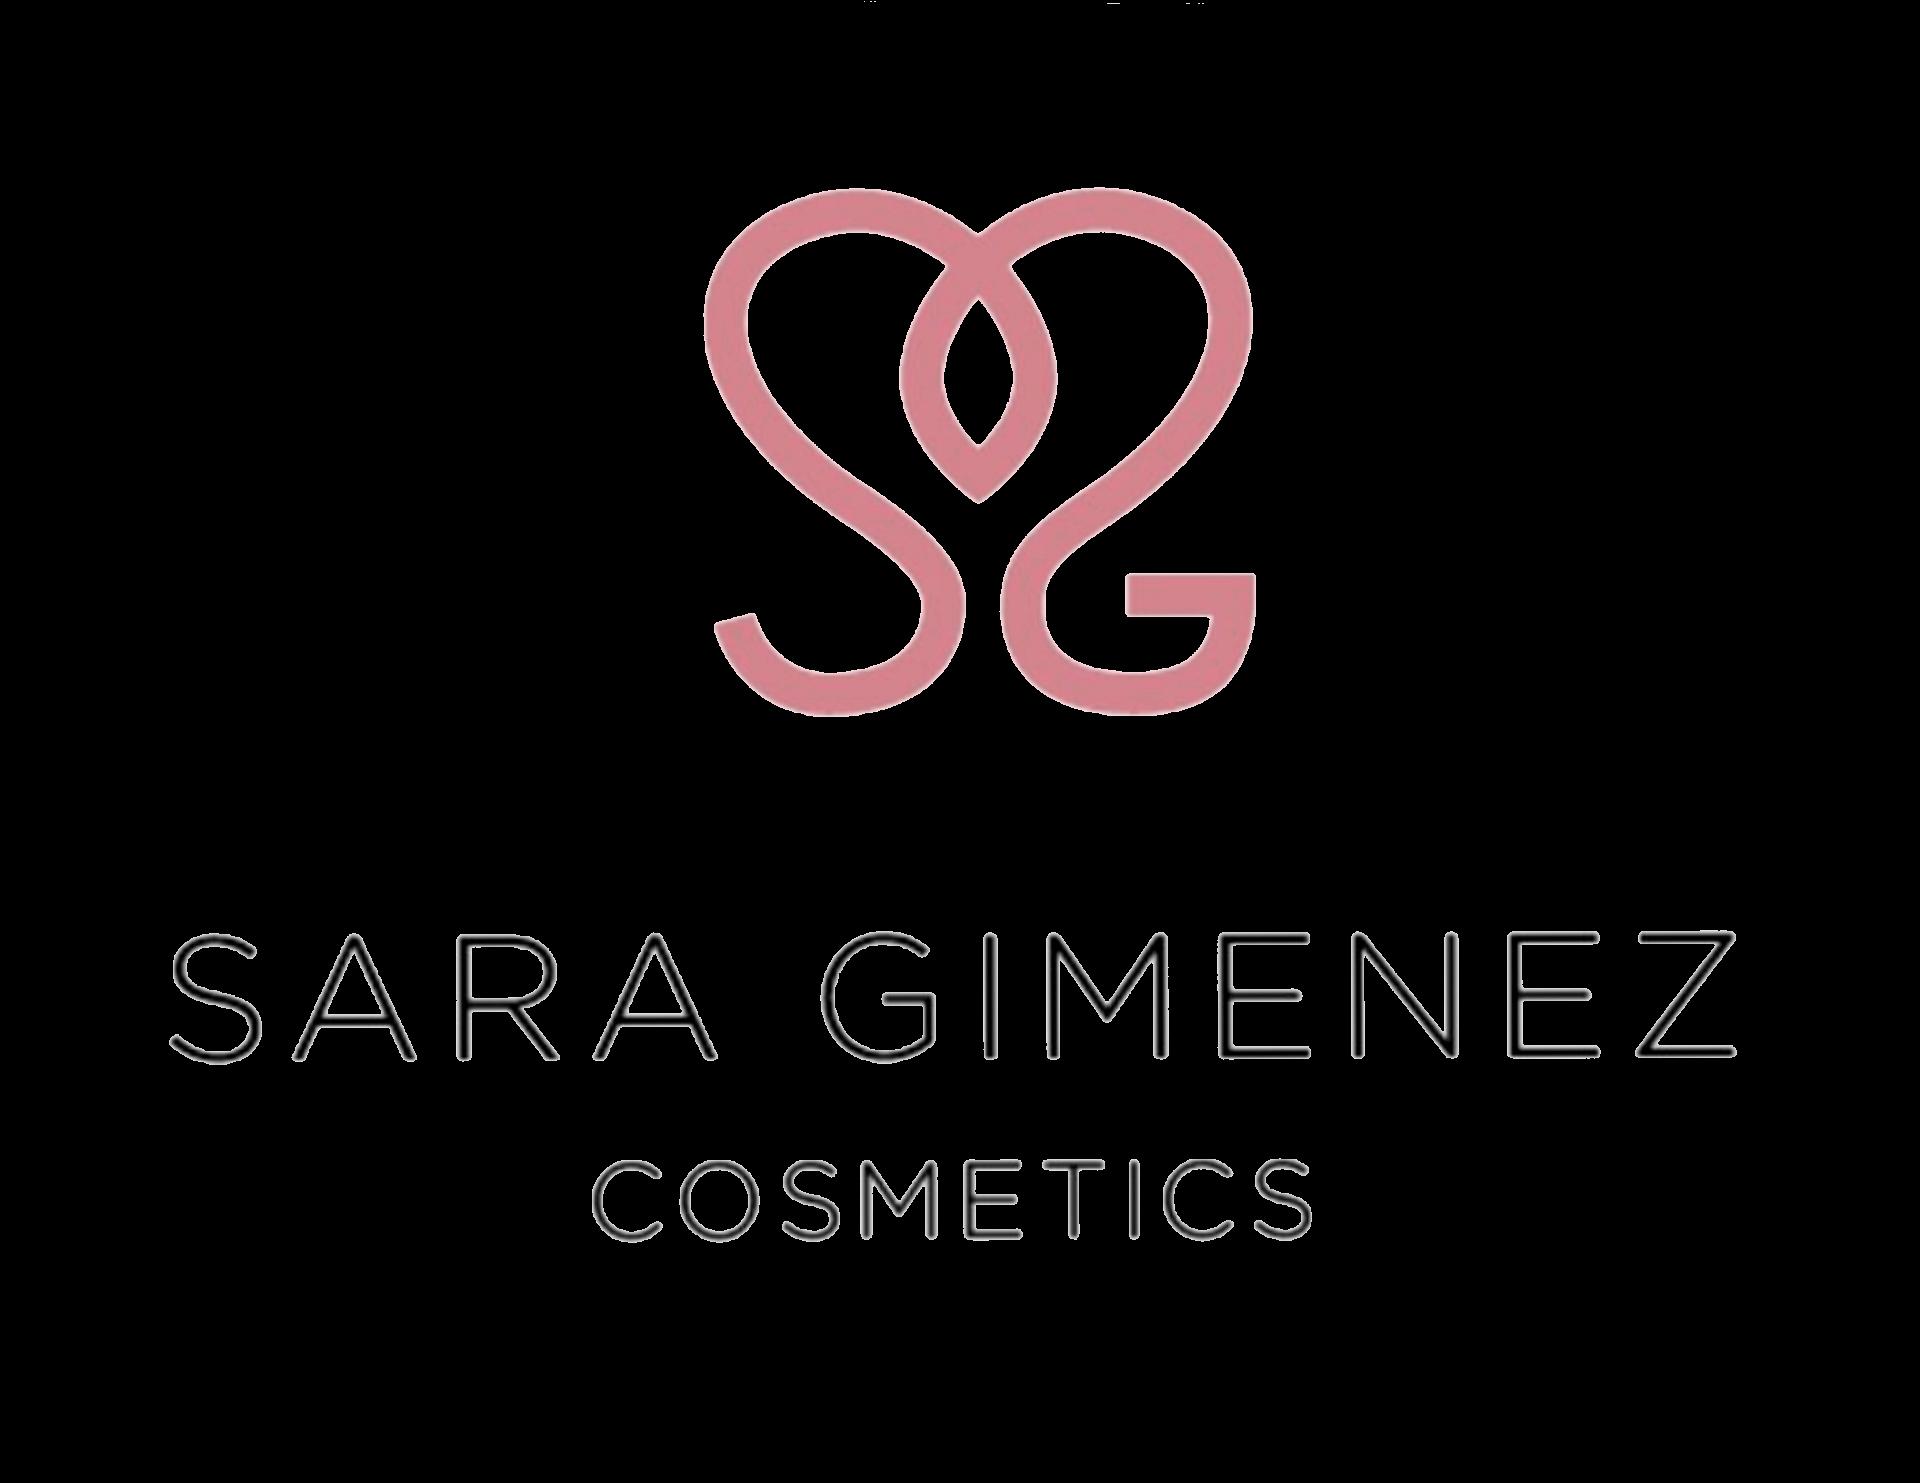 Sara Gimenez cosmetics